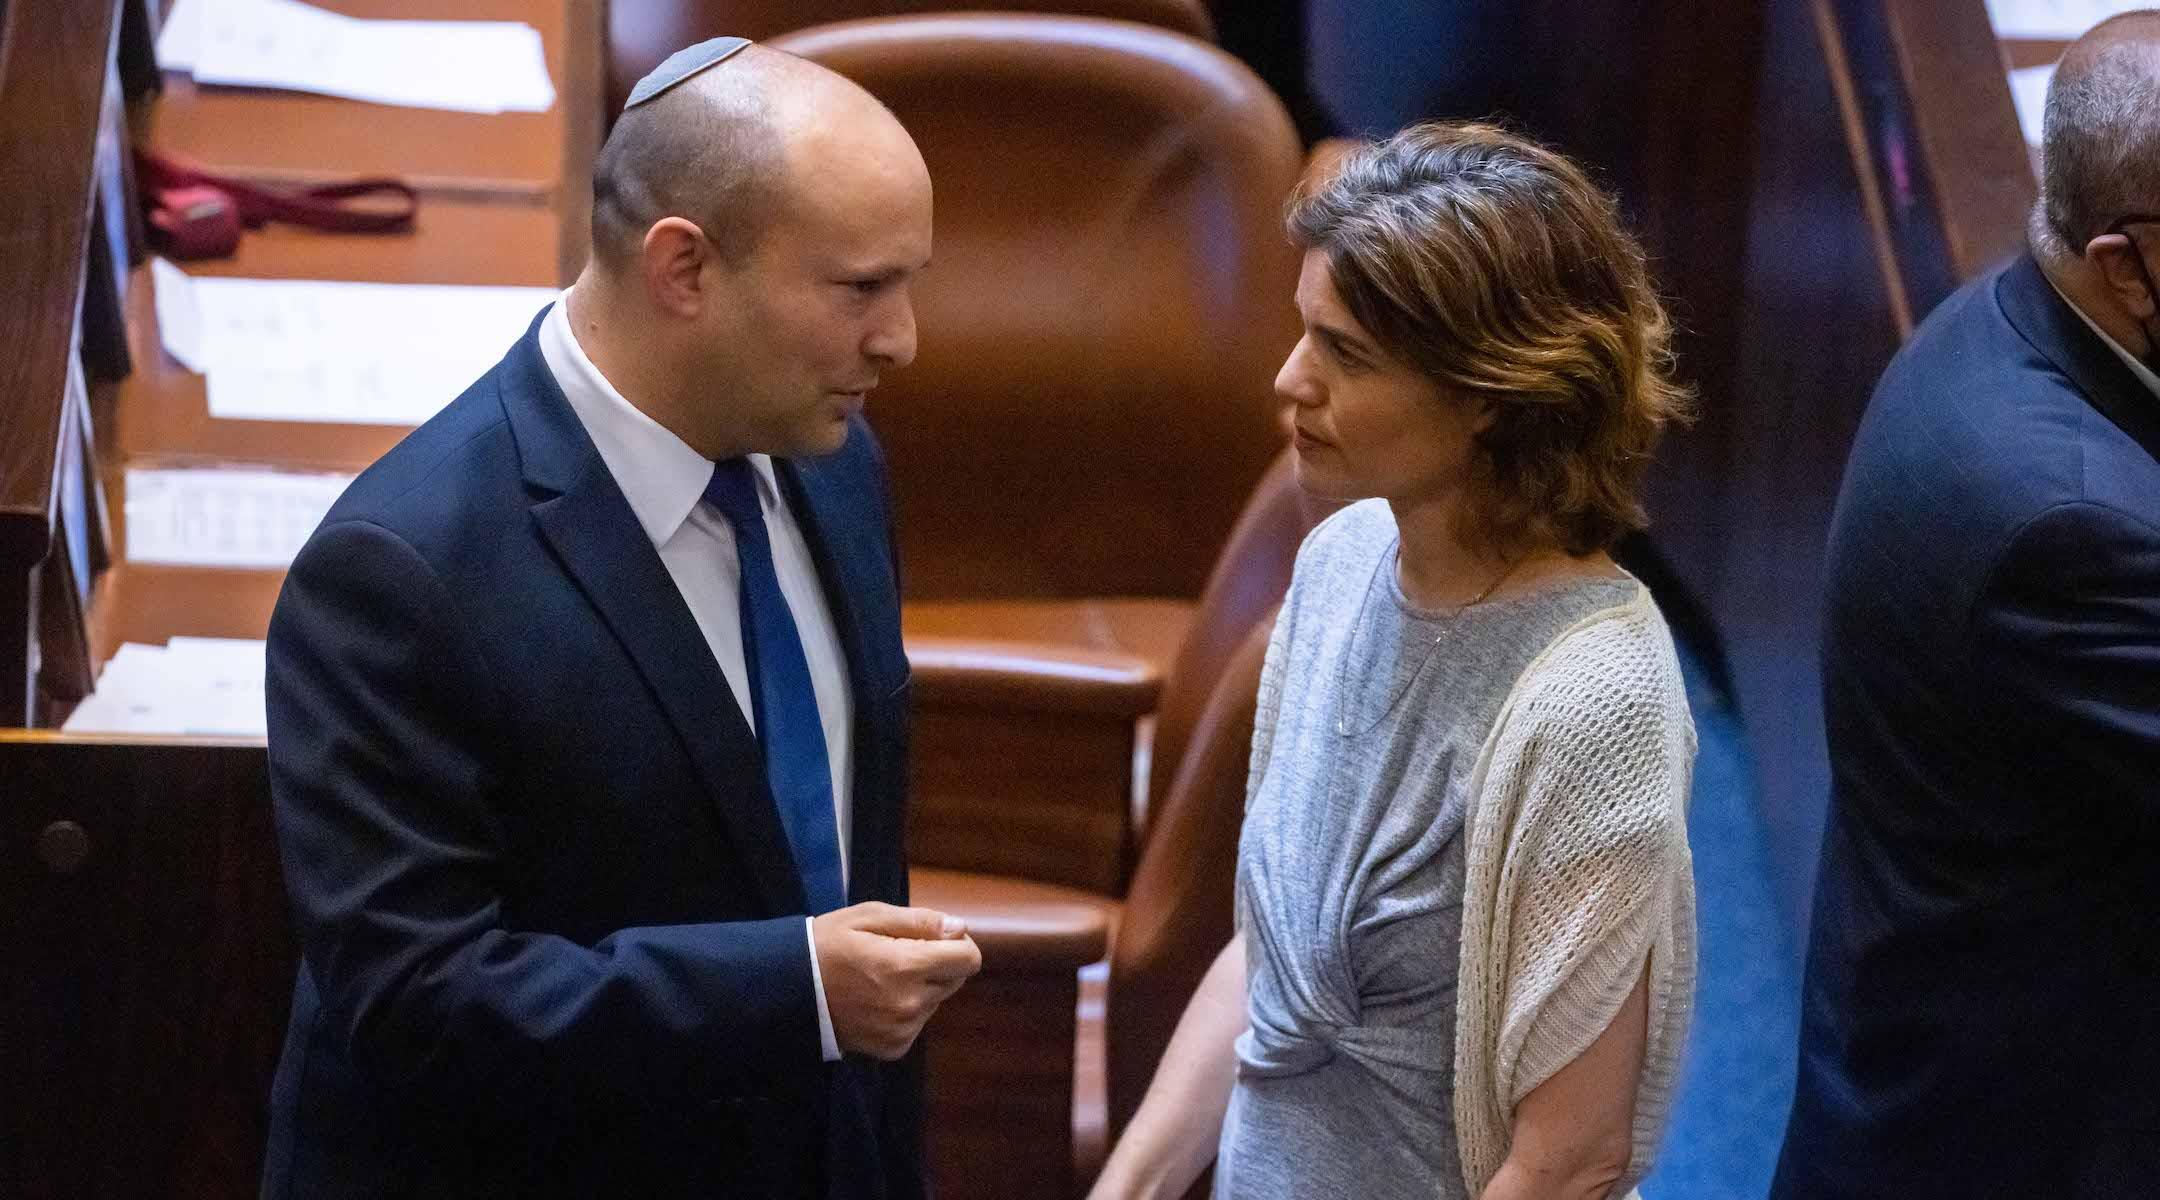 Naftali Bennett and Tamar Zandberg